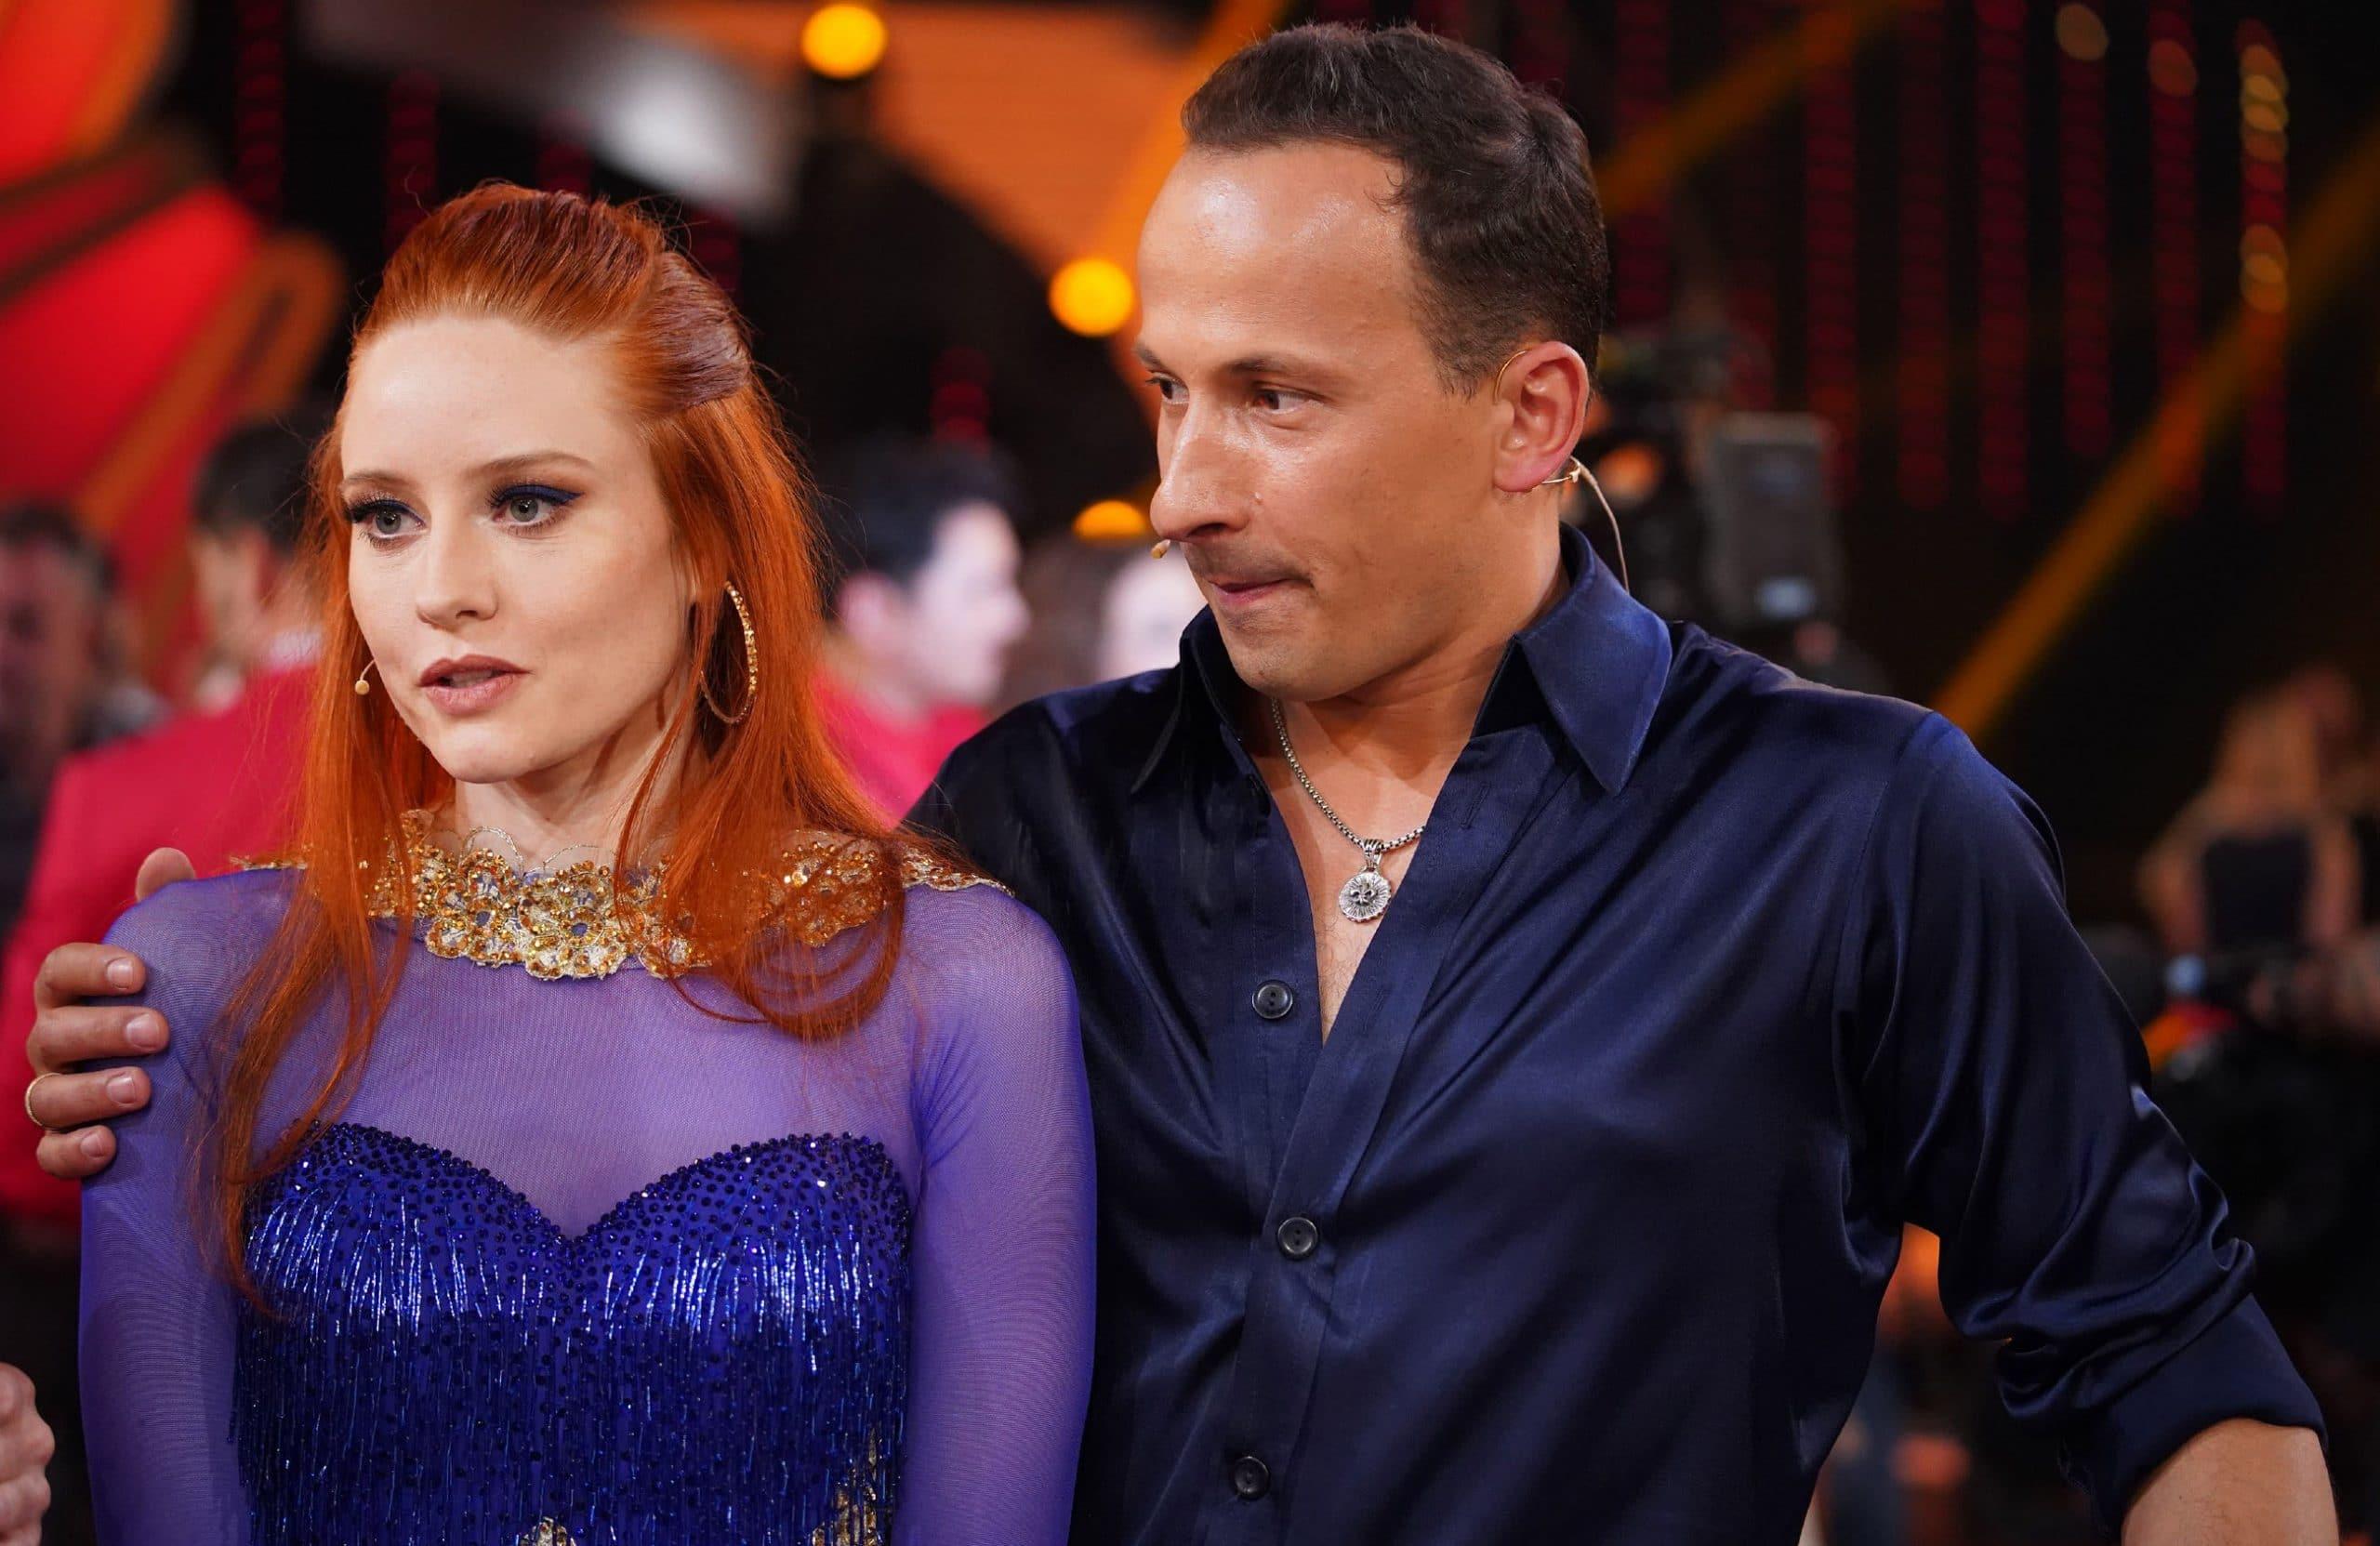 Barbara Meier und Sergiu Luca - Let's Dance